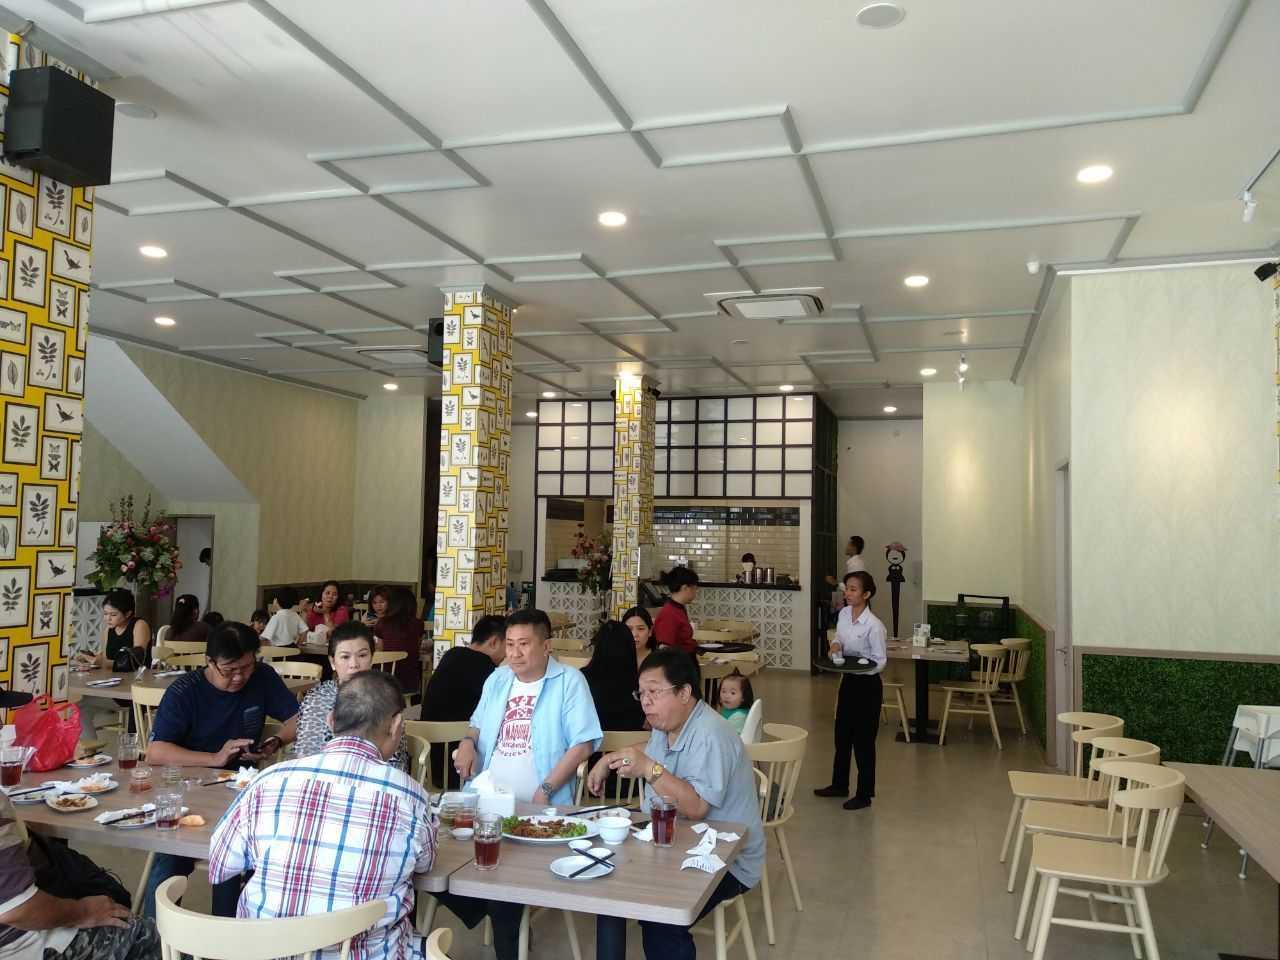 Mimic Concept Restaurant - Pluit Pluit, Penjaringan, Kota Jkt Utara, Daerah Khusus Ibukota Jakarta, Indonesia Pluit, Penjaringan, Kota Jkt Utara, Daerah Khusus Ibukota Jakarta, Indonesia Dining Room (F&b)  55618